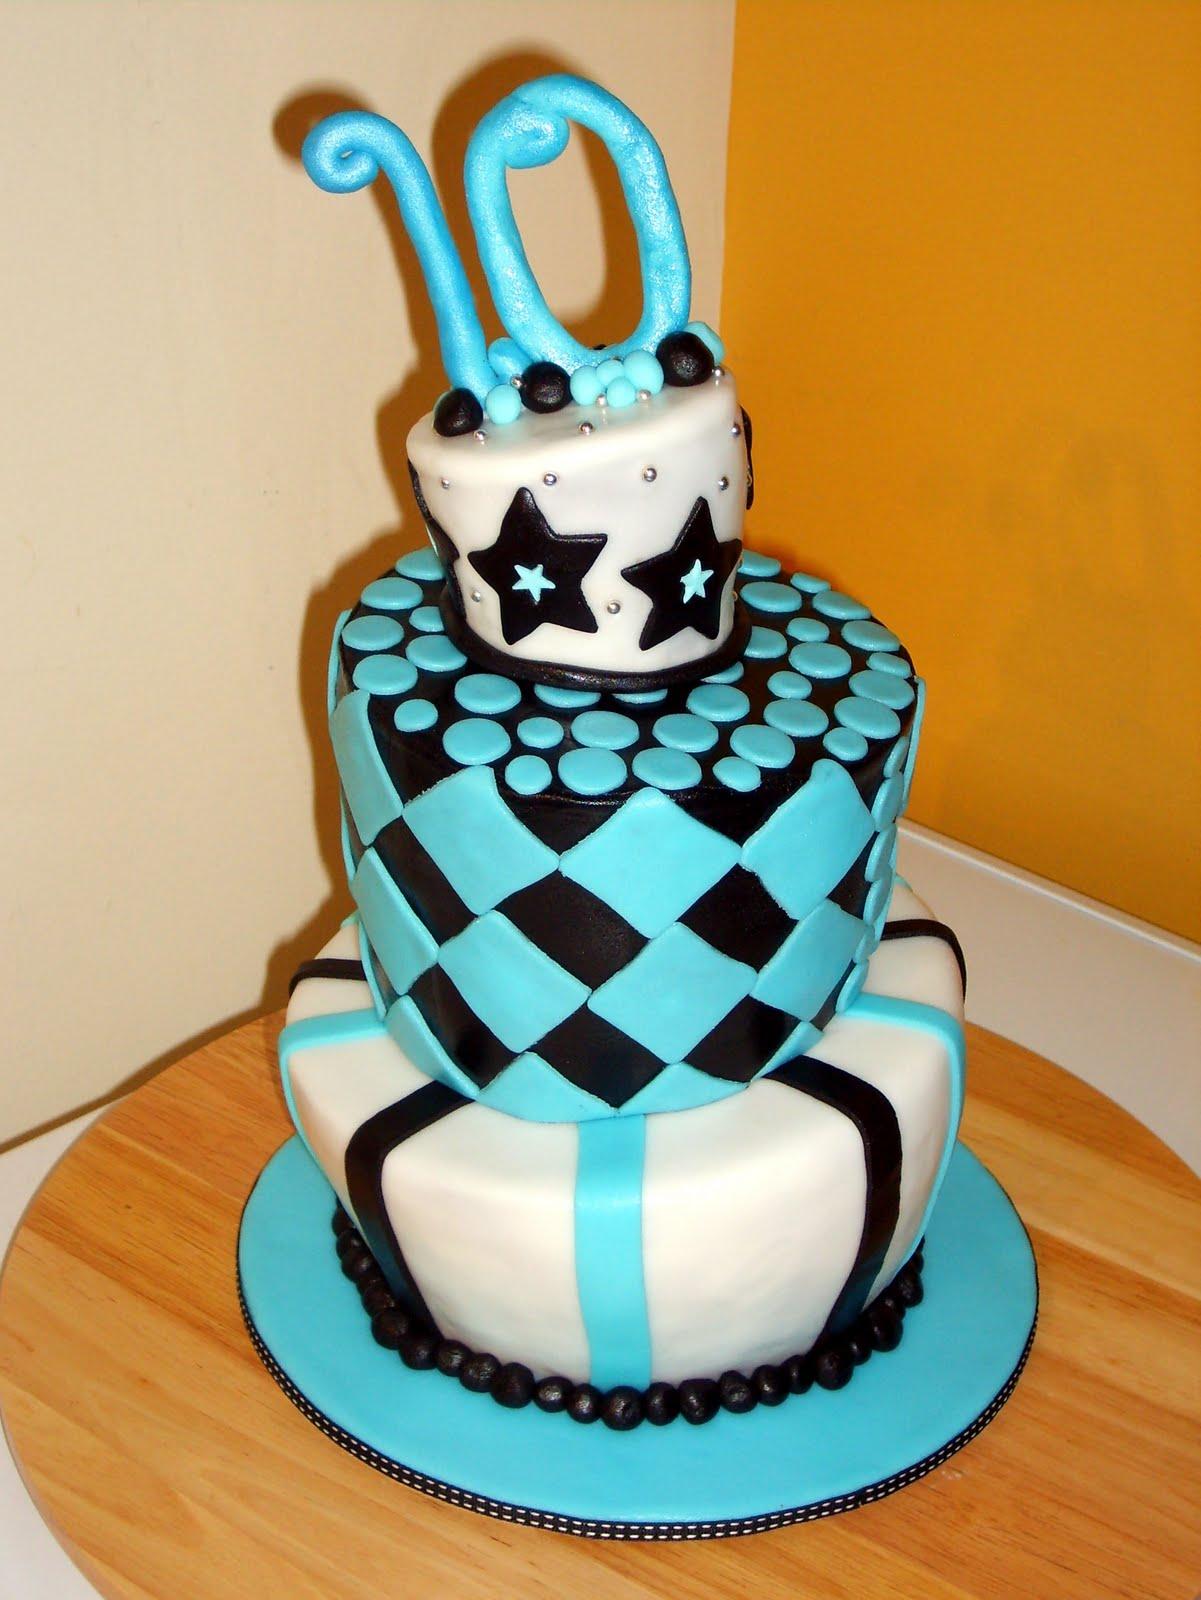 Girls 10th Birthday Cake